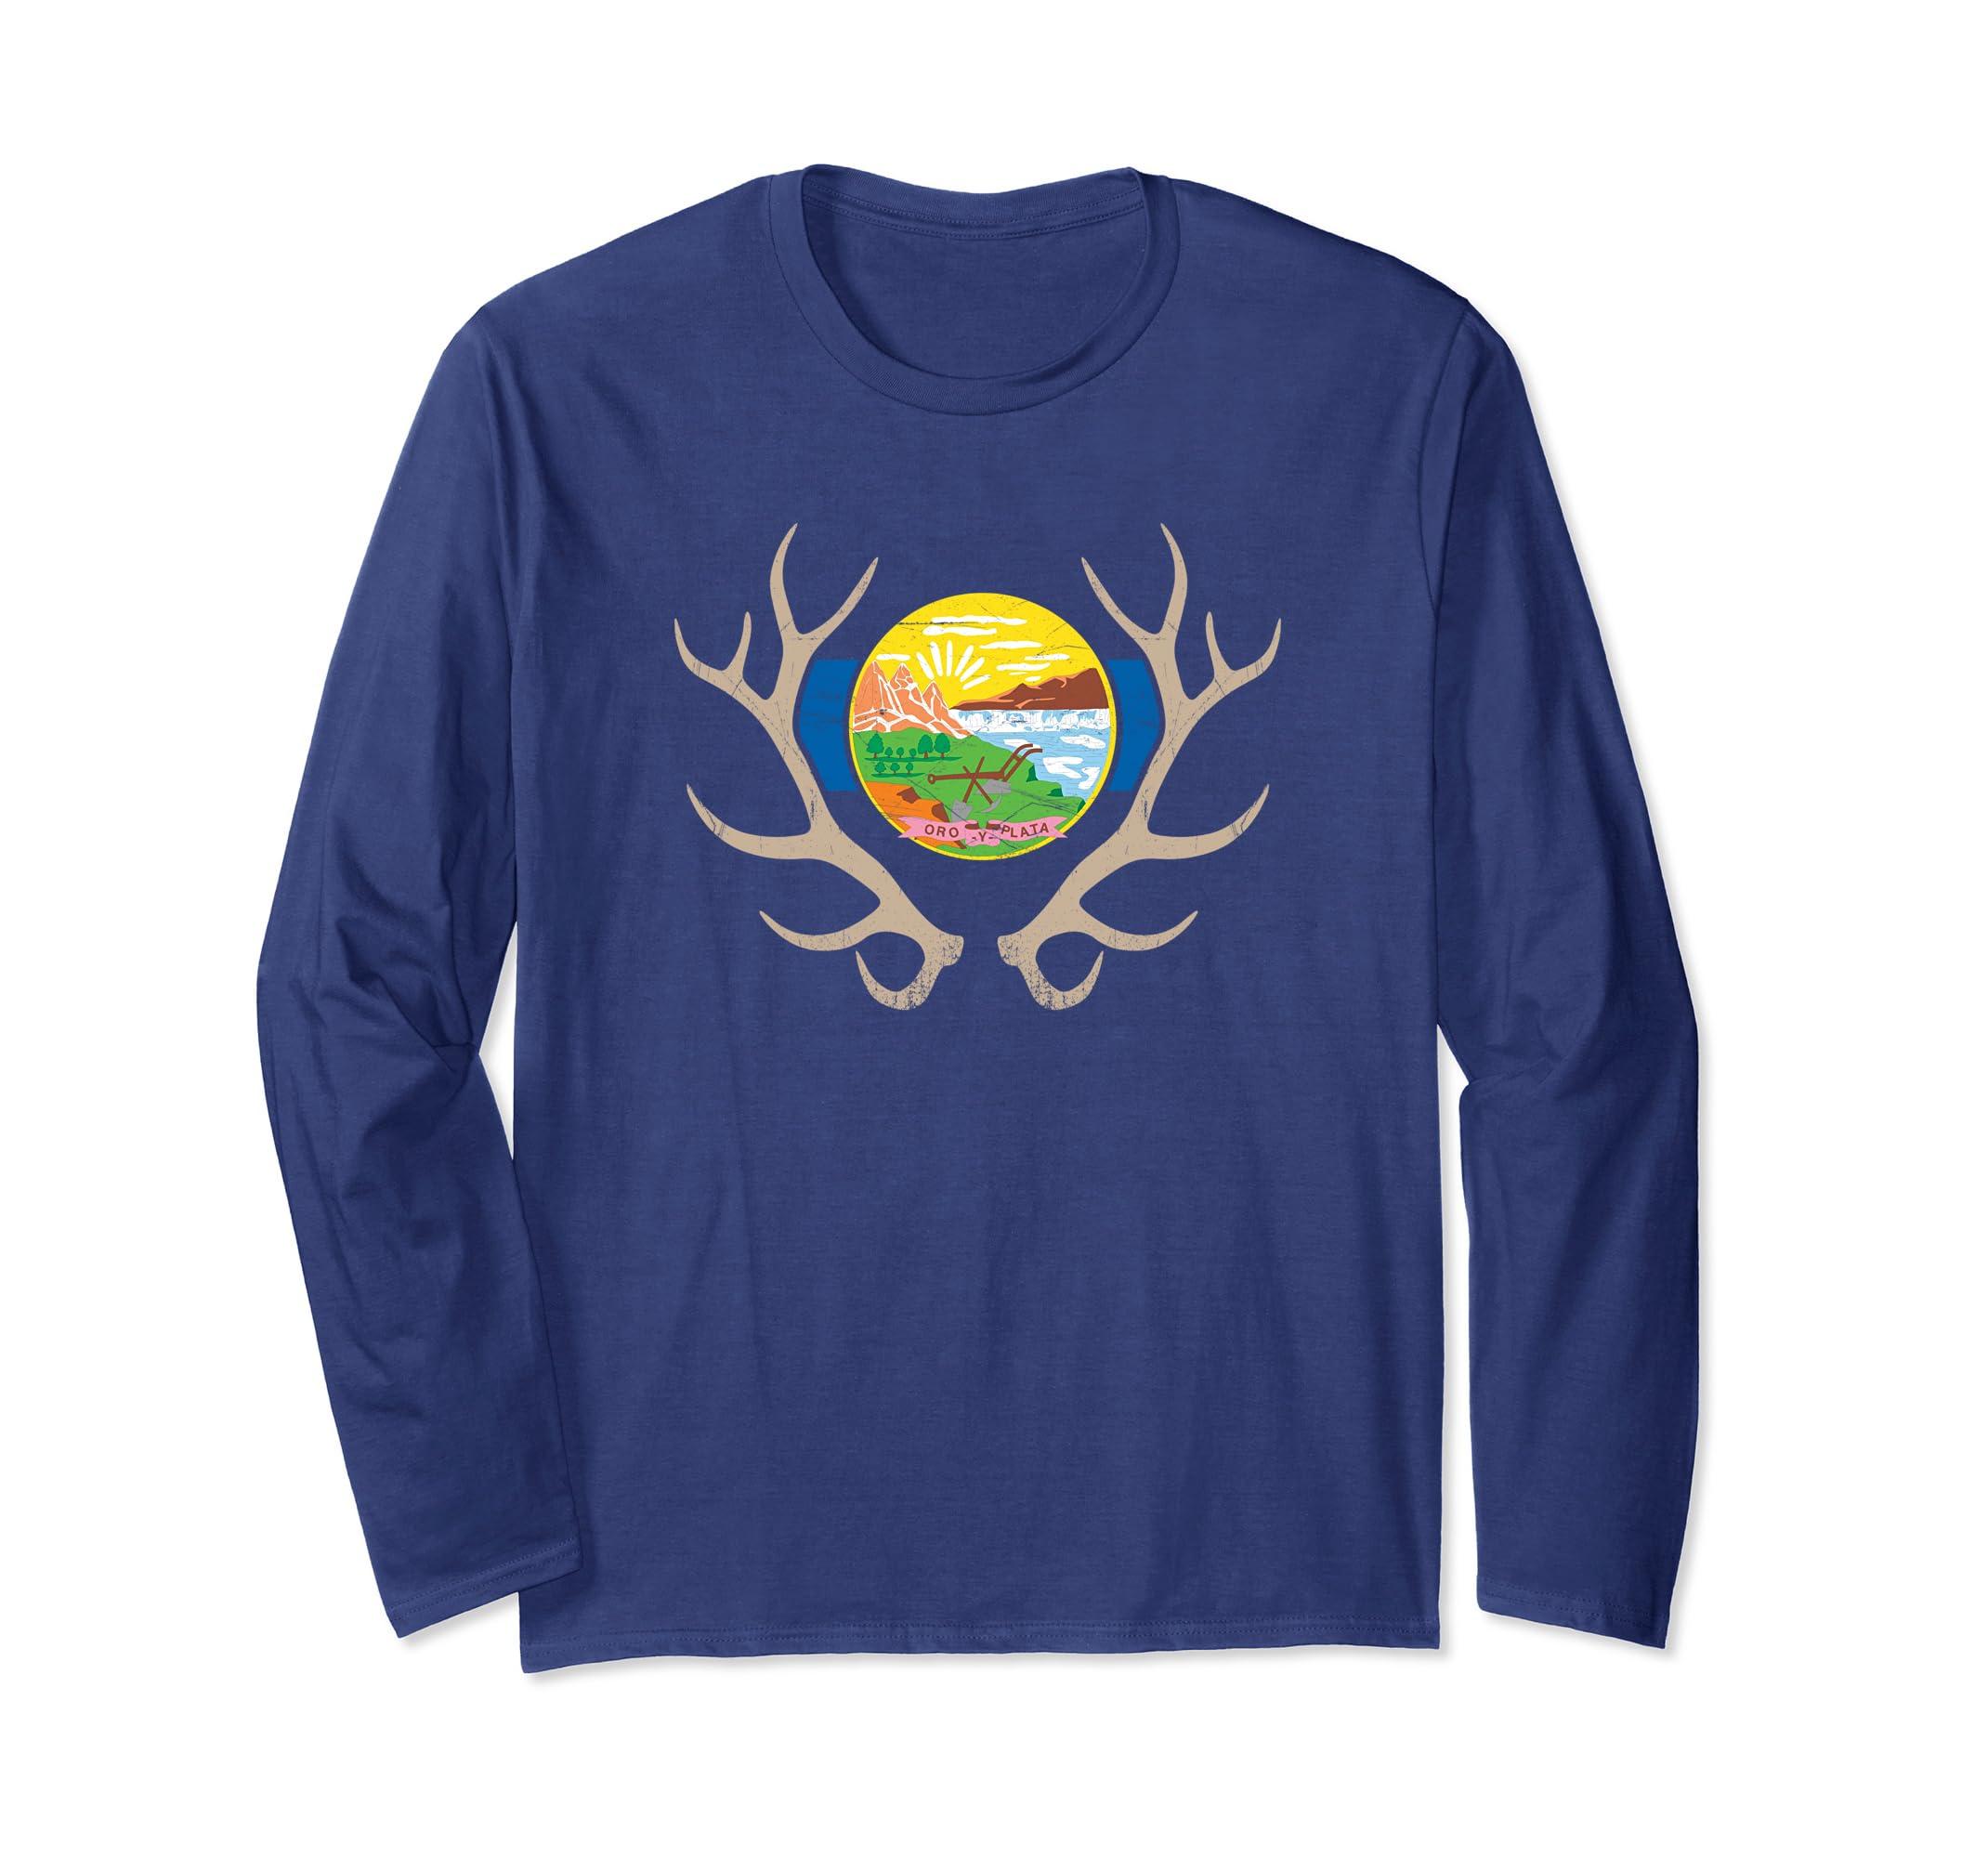 Amazon com: Montana Elk Hunt Long Sleeve Shirt - MT State